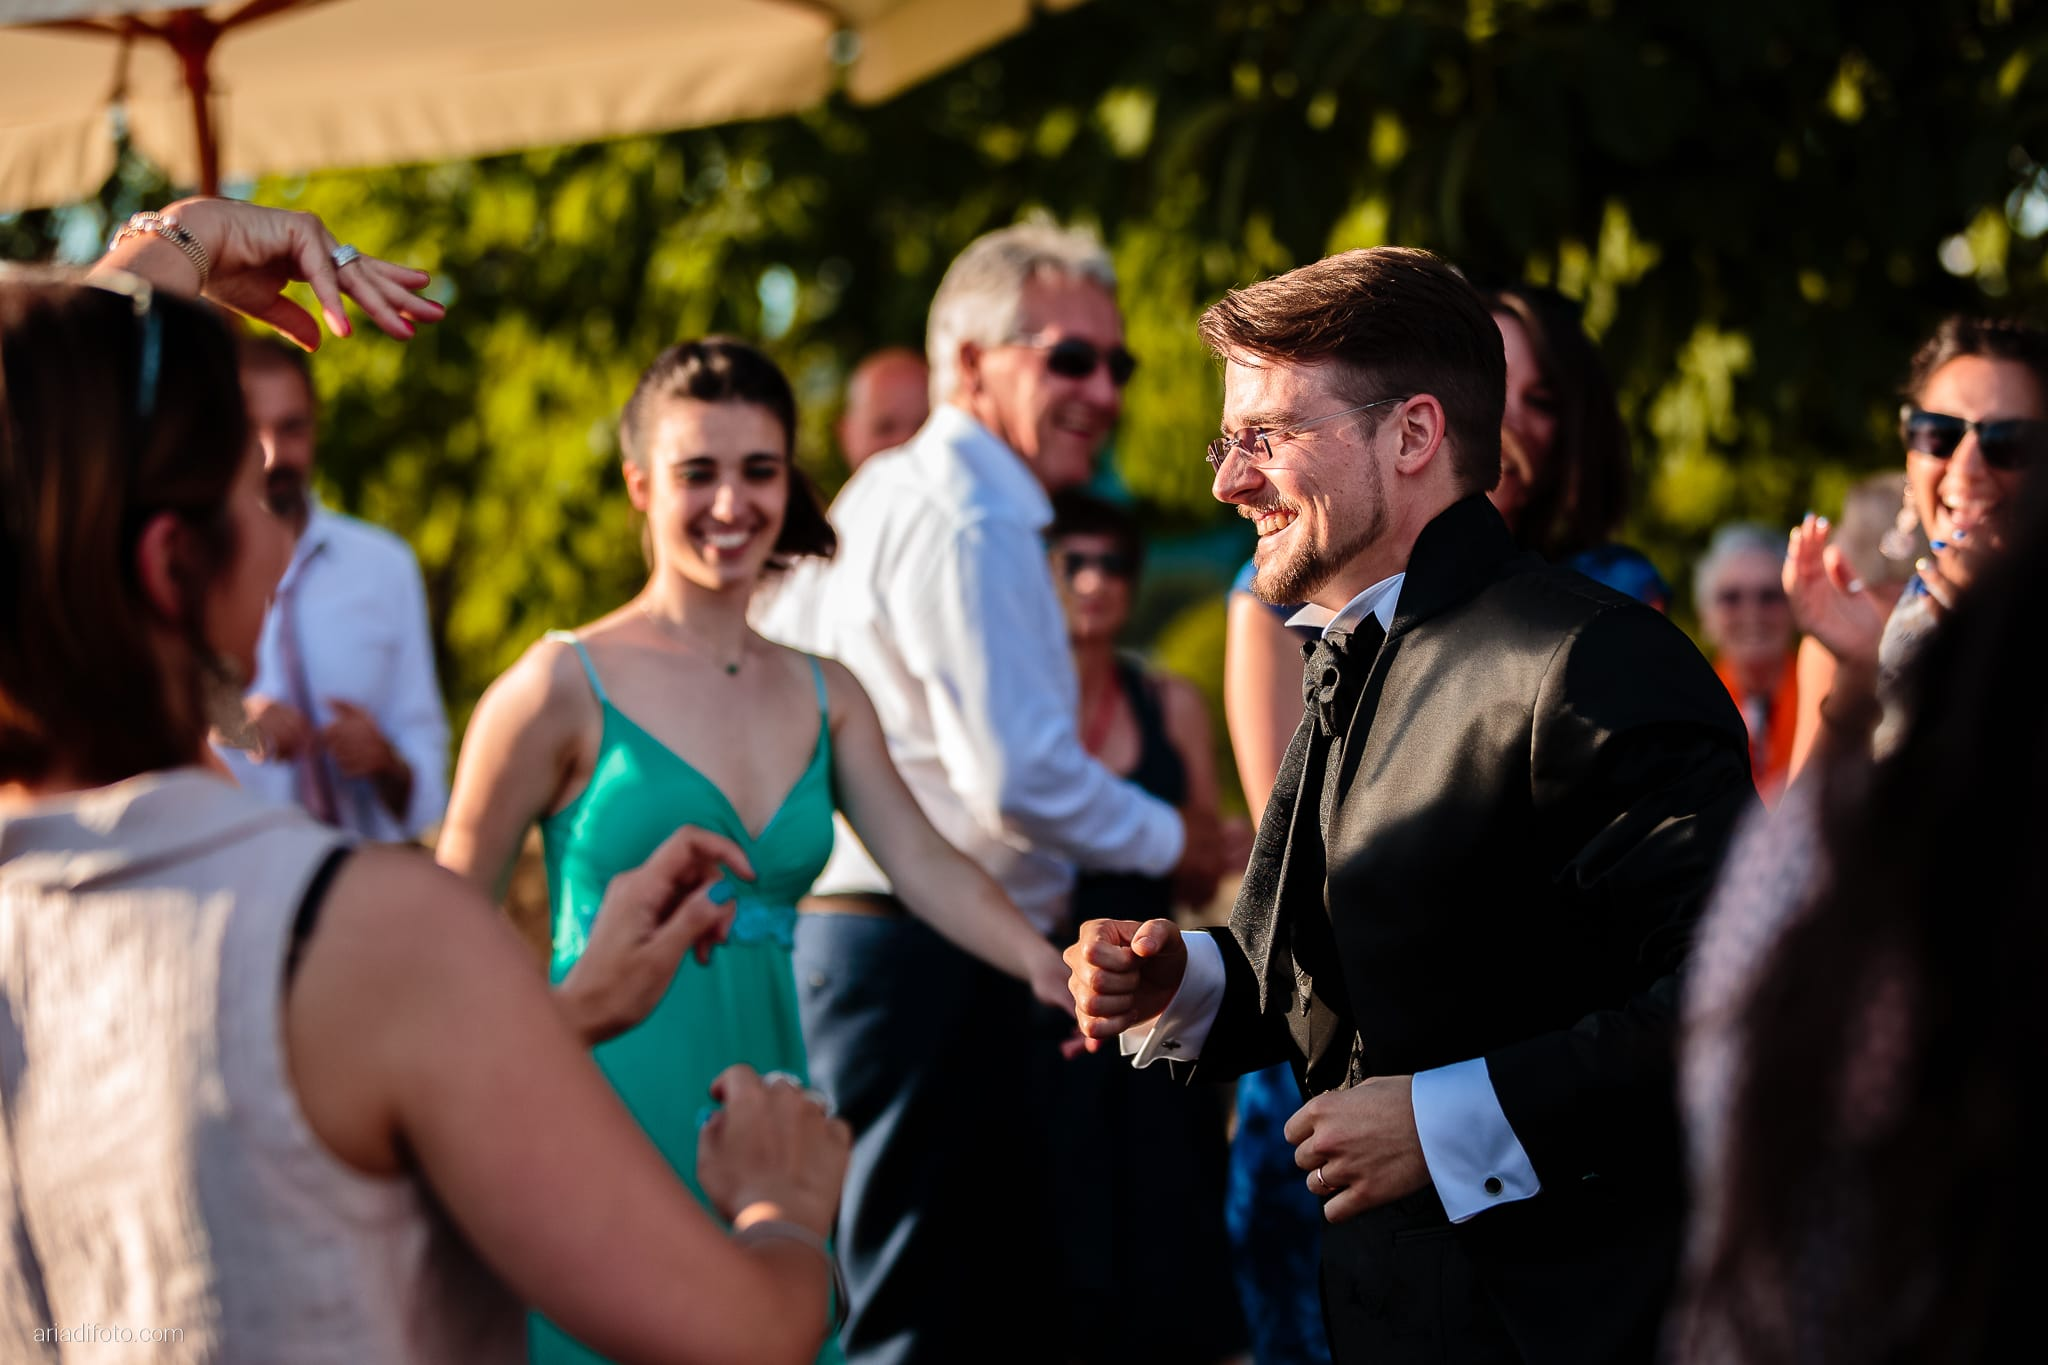 Martina Daniele Matrimonio Duino Baronesse Tacco Collio Gorizia ricevimento festa balli